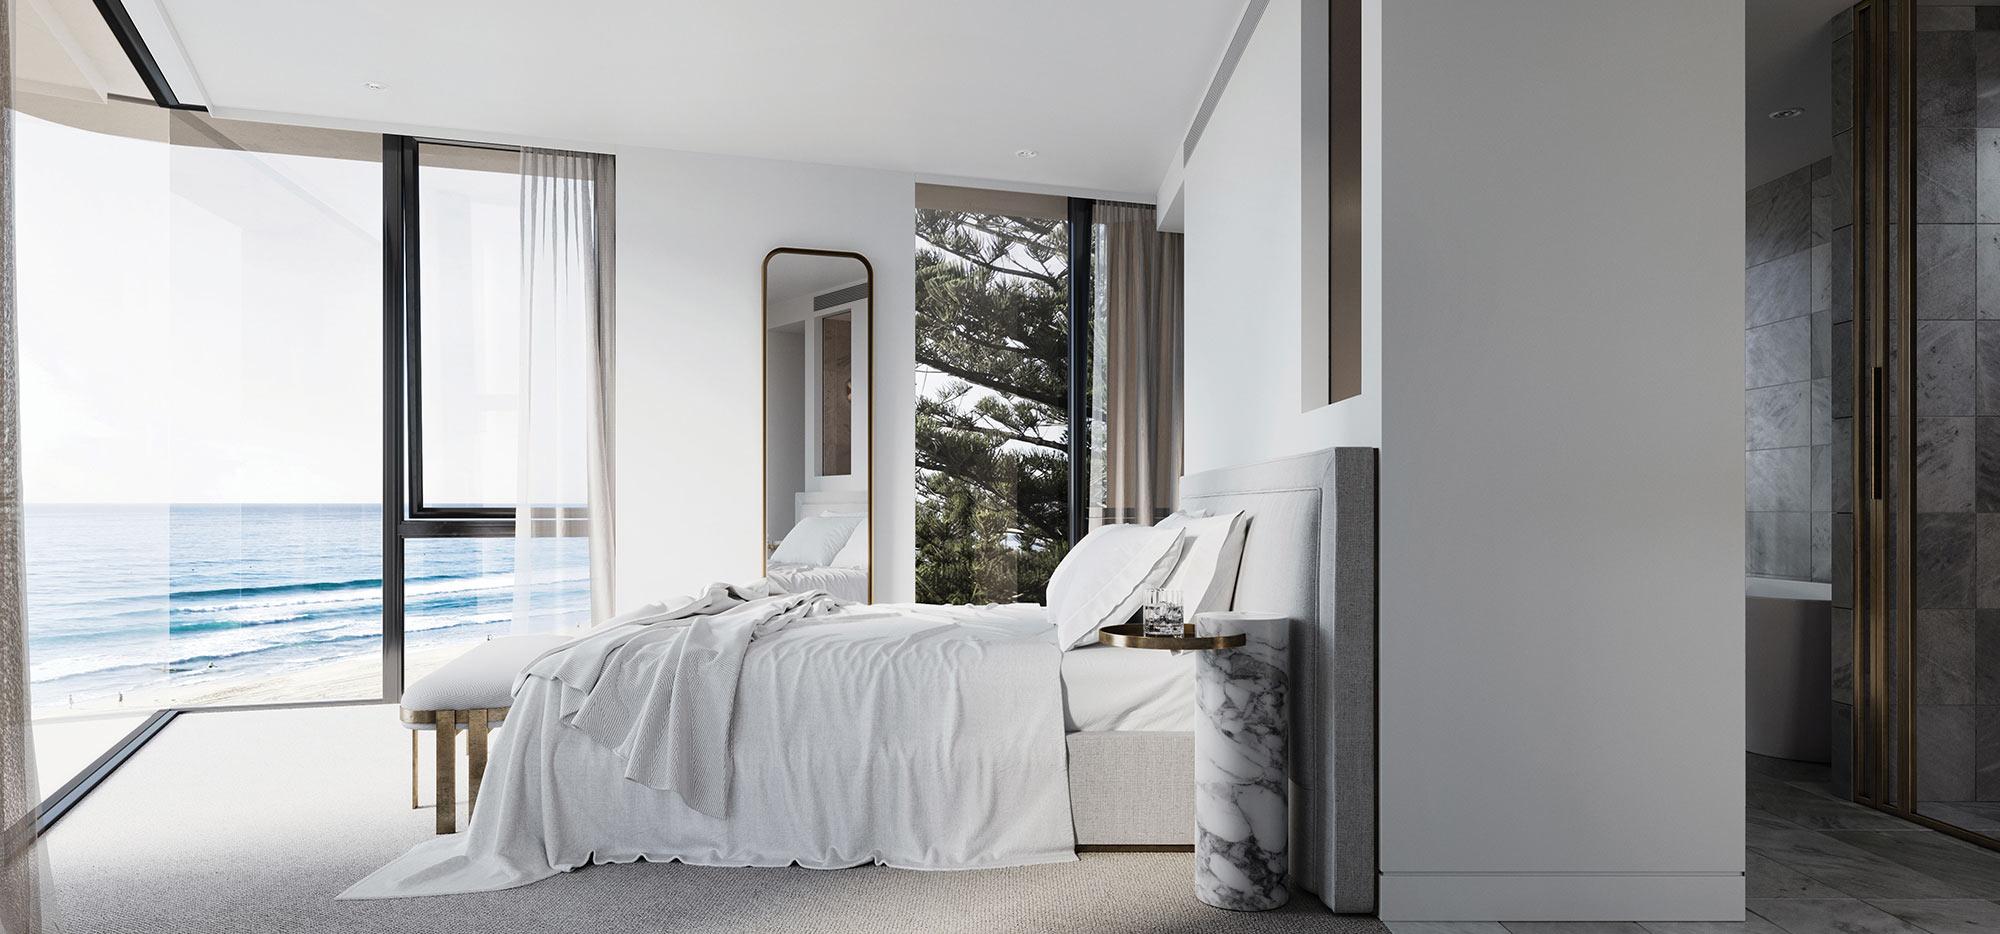 Solace-Broadbeach-Bedroom-New.jpg